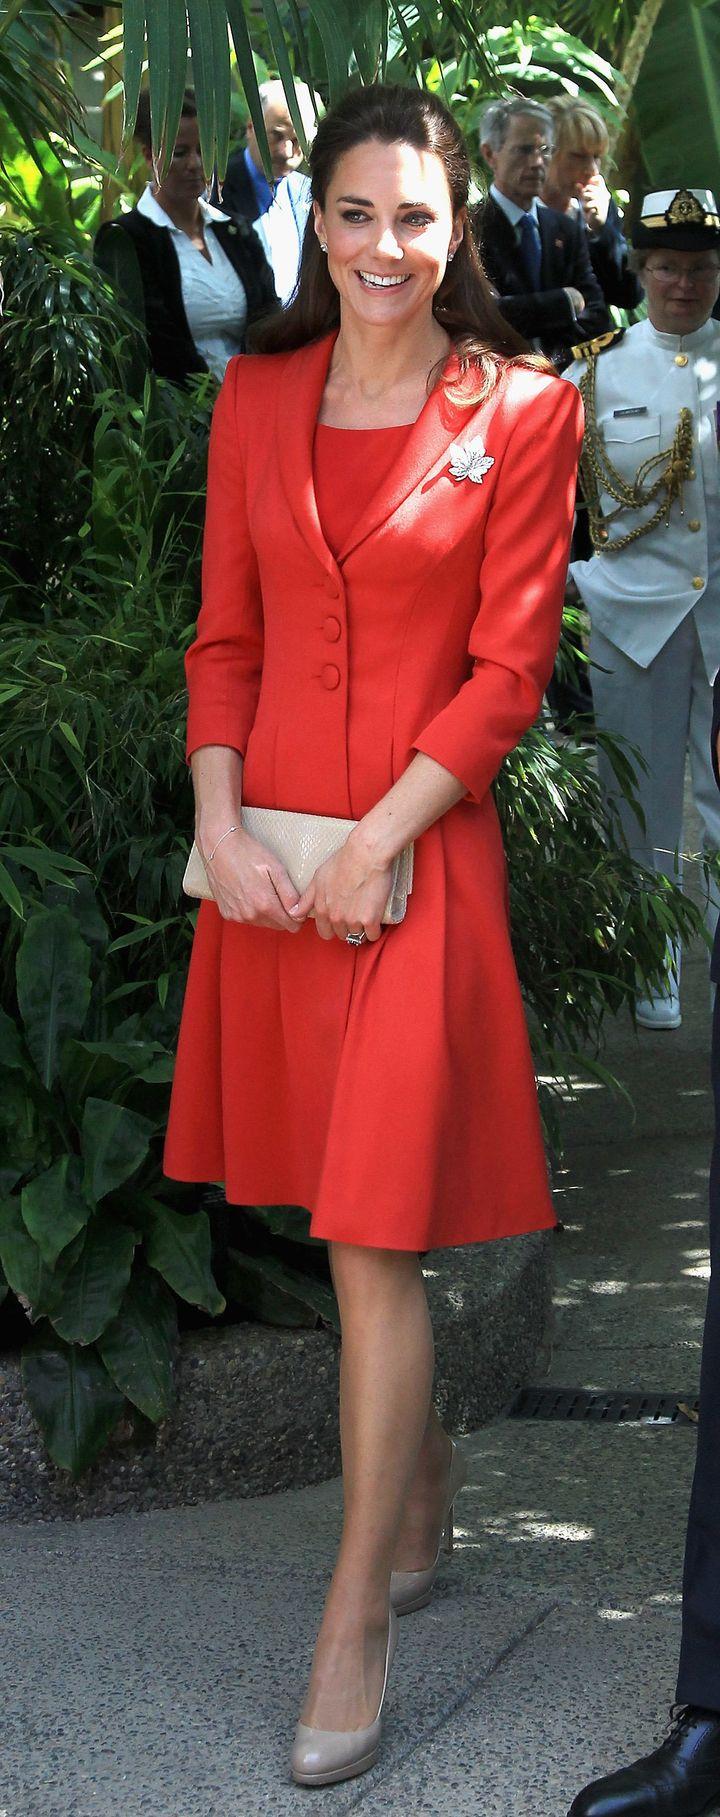 In Catherine Walker, in Calgary, Canada on 8 July 2011.